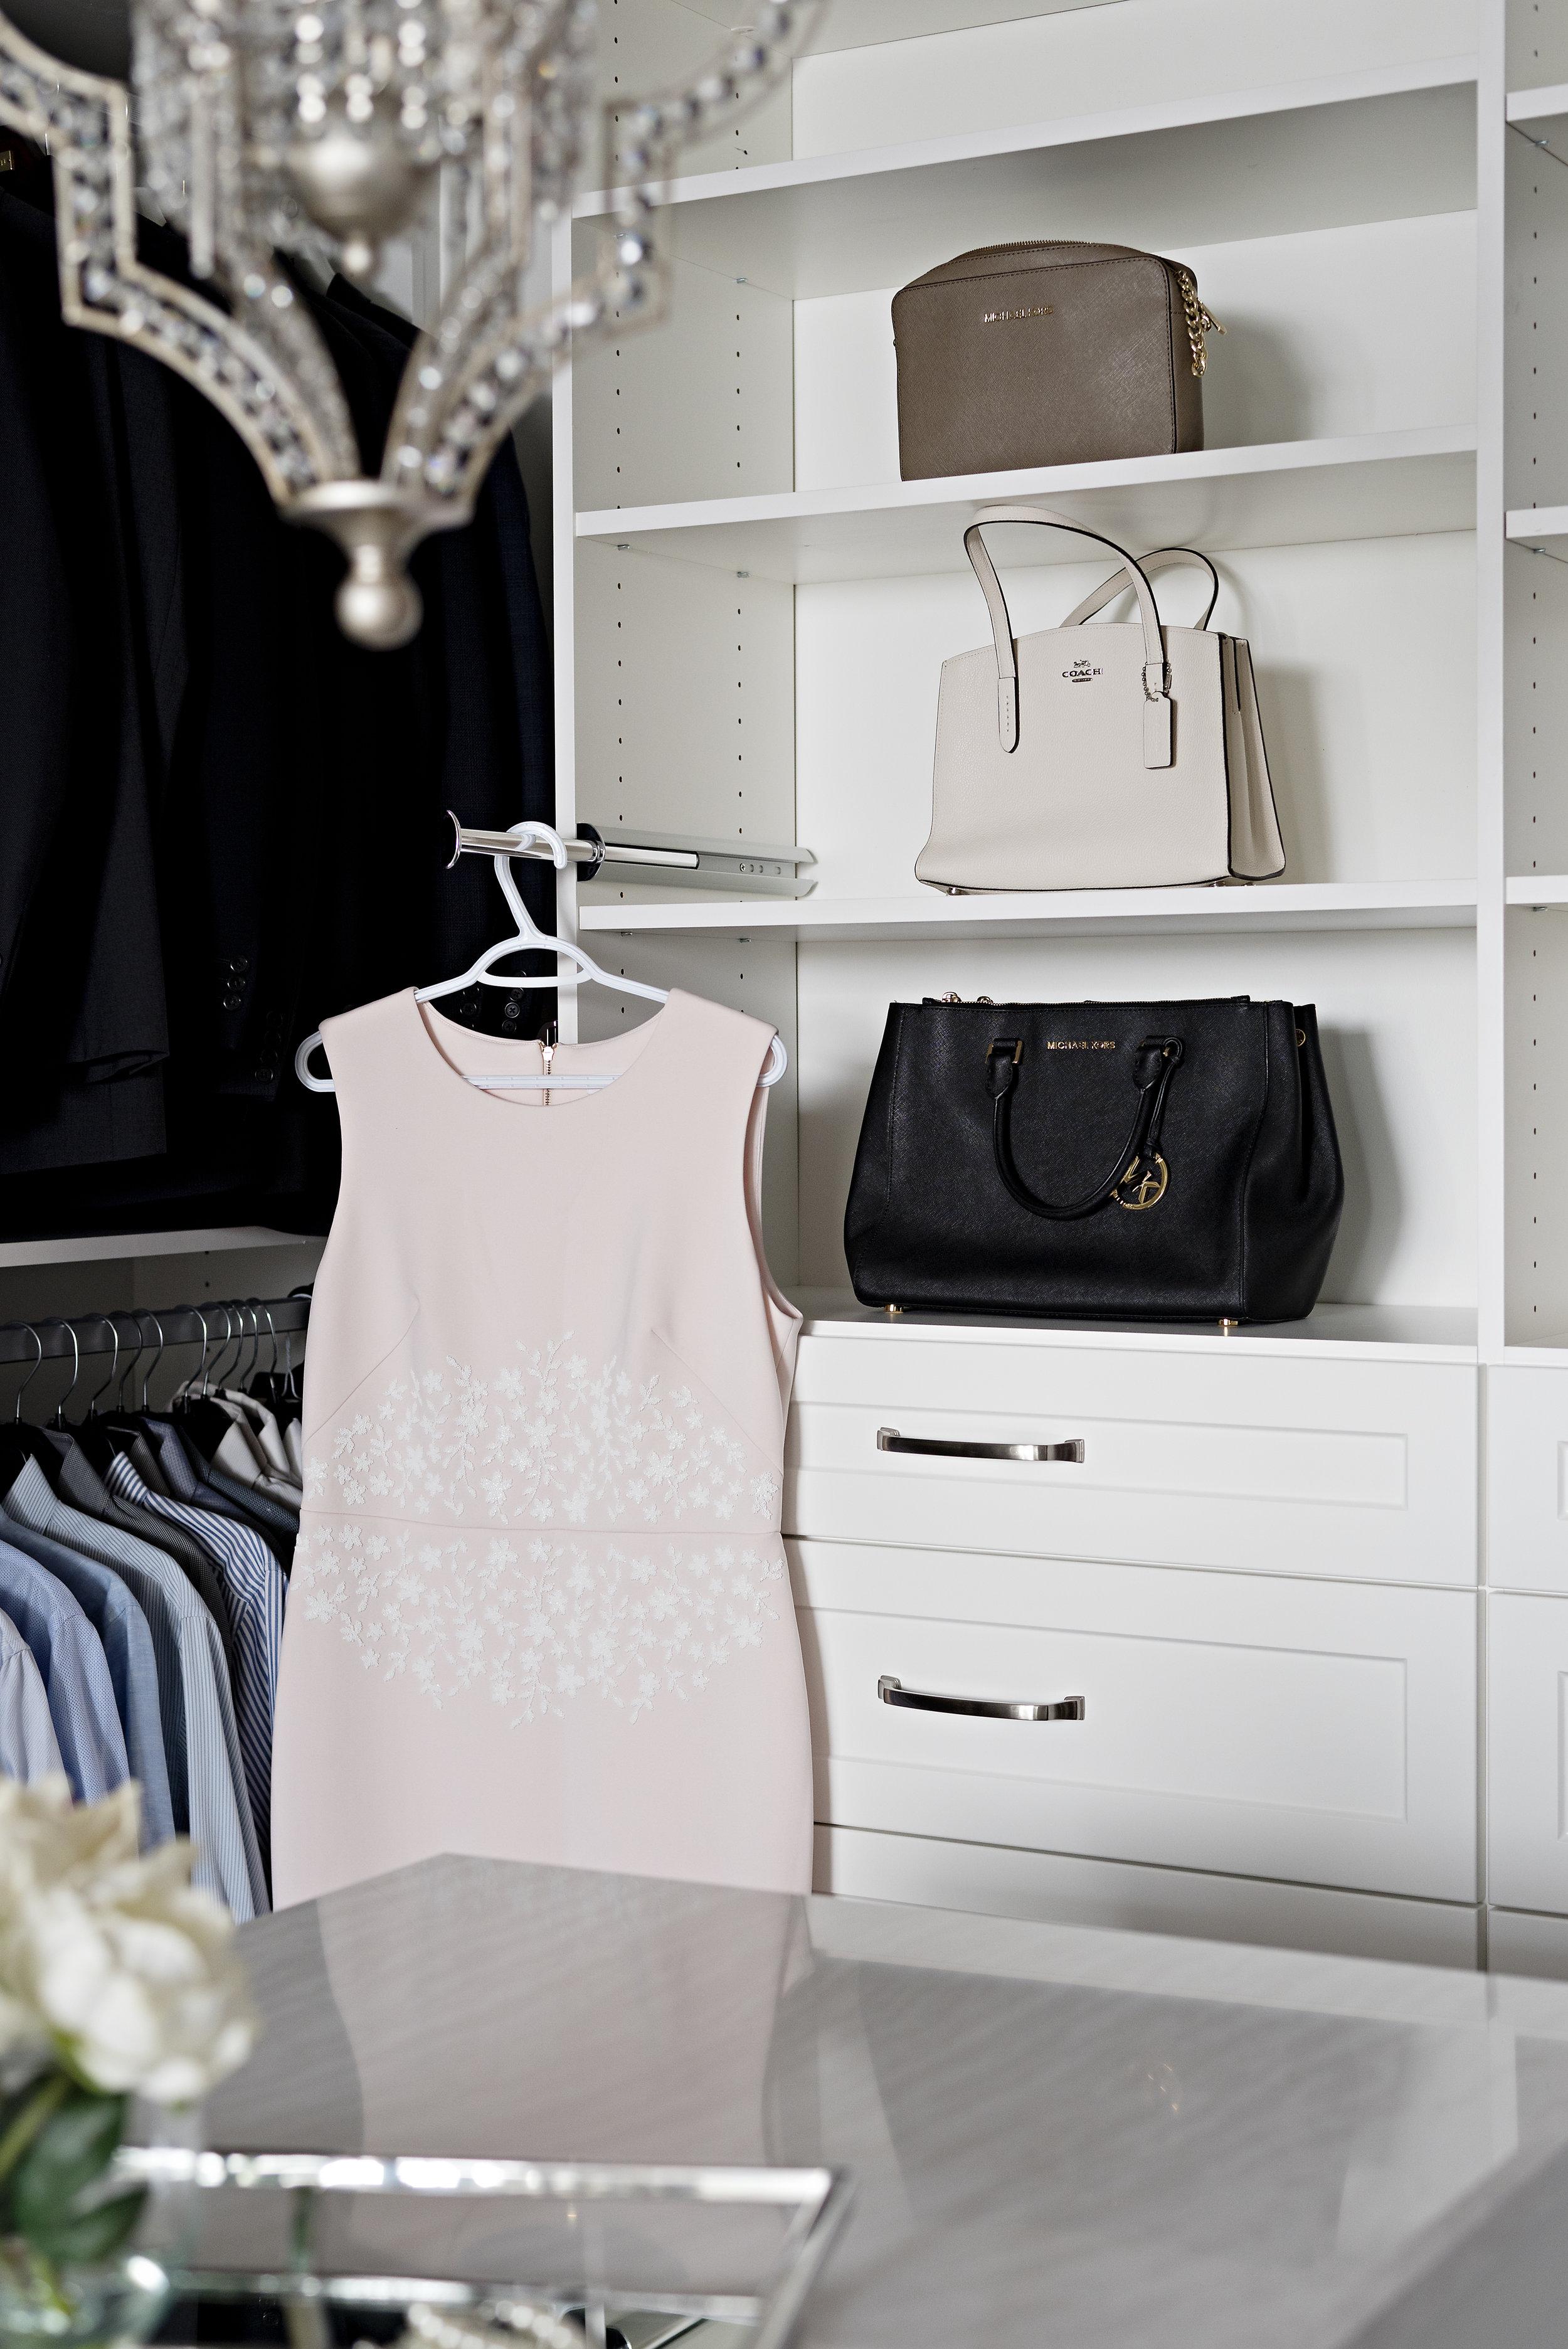 pizzale design interior design walk in closet organization hanging clothes polished chrome finish purse open storage white shaker cabinet drawer .jpg